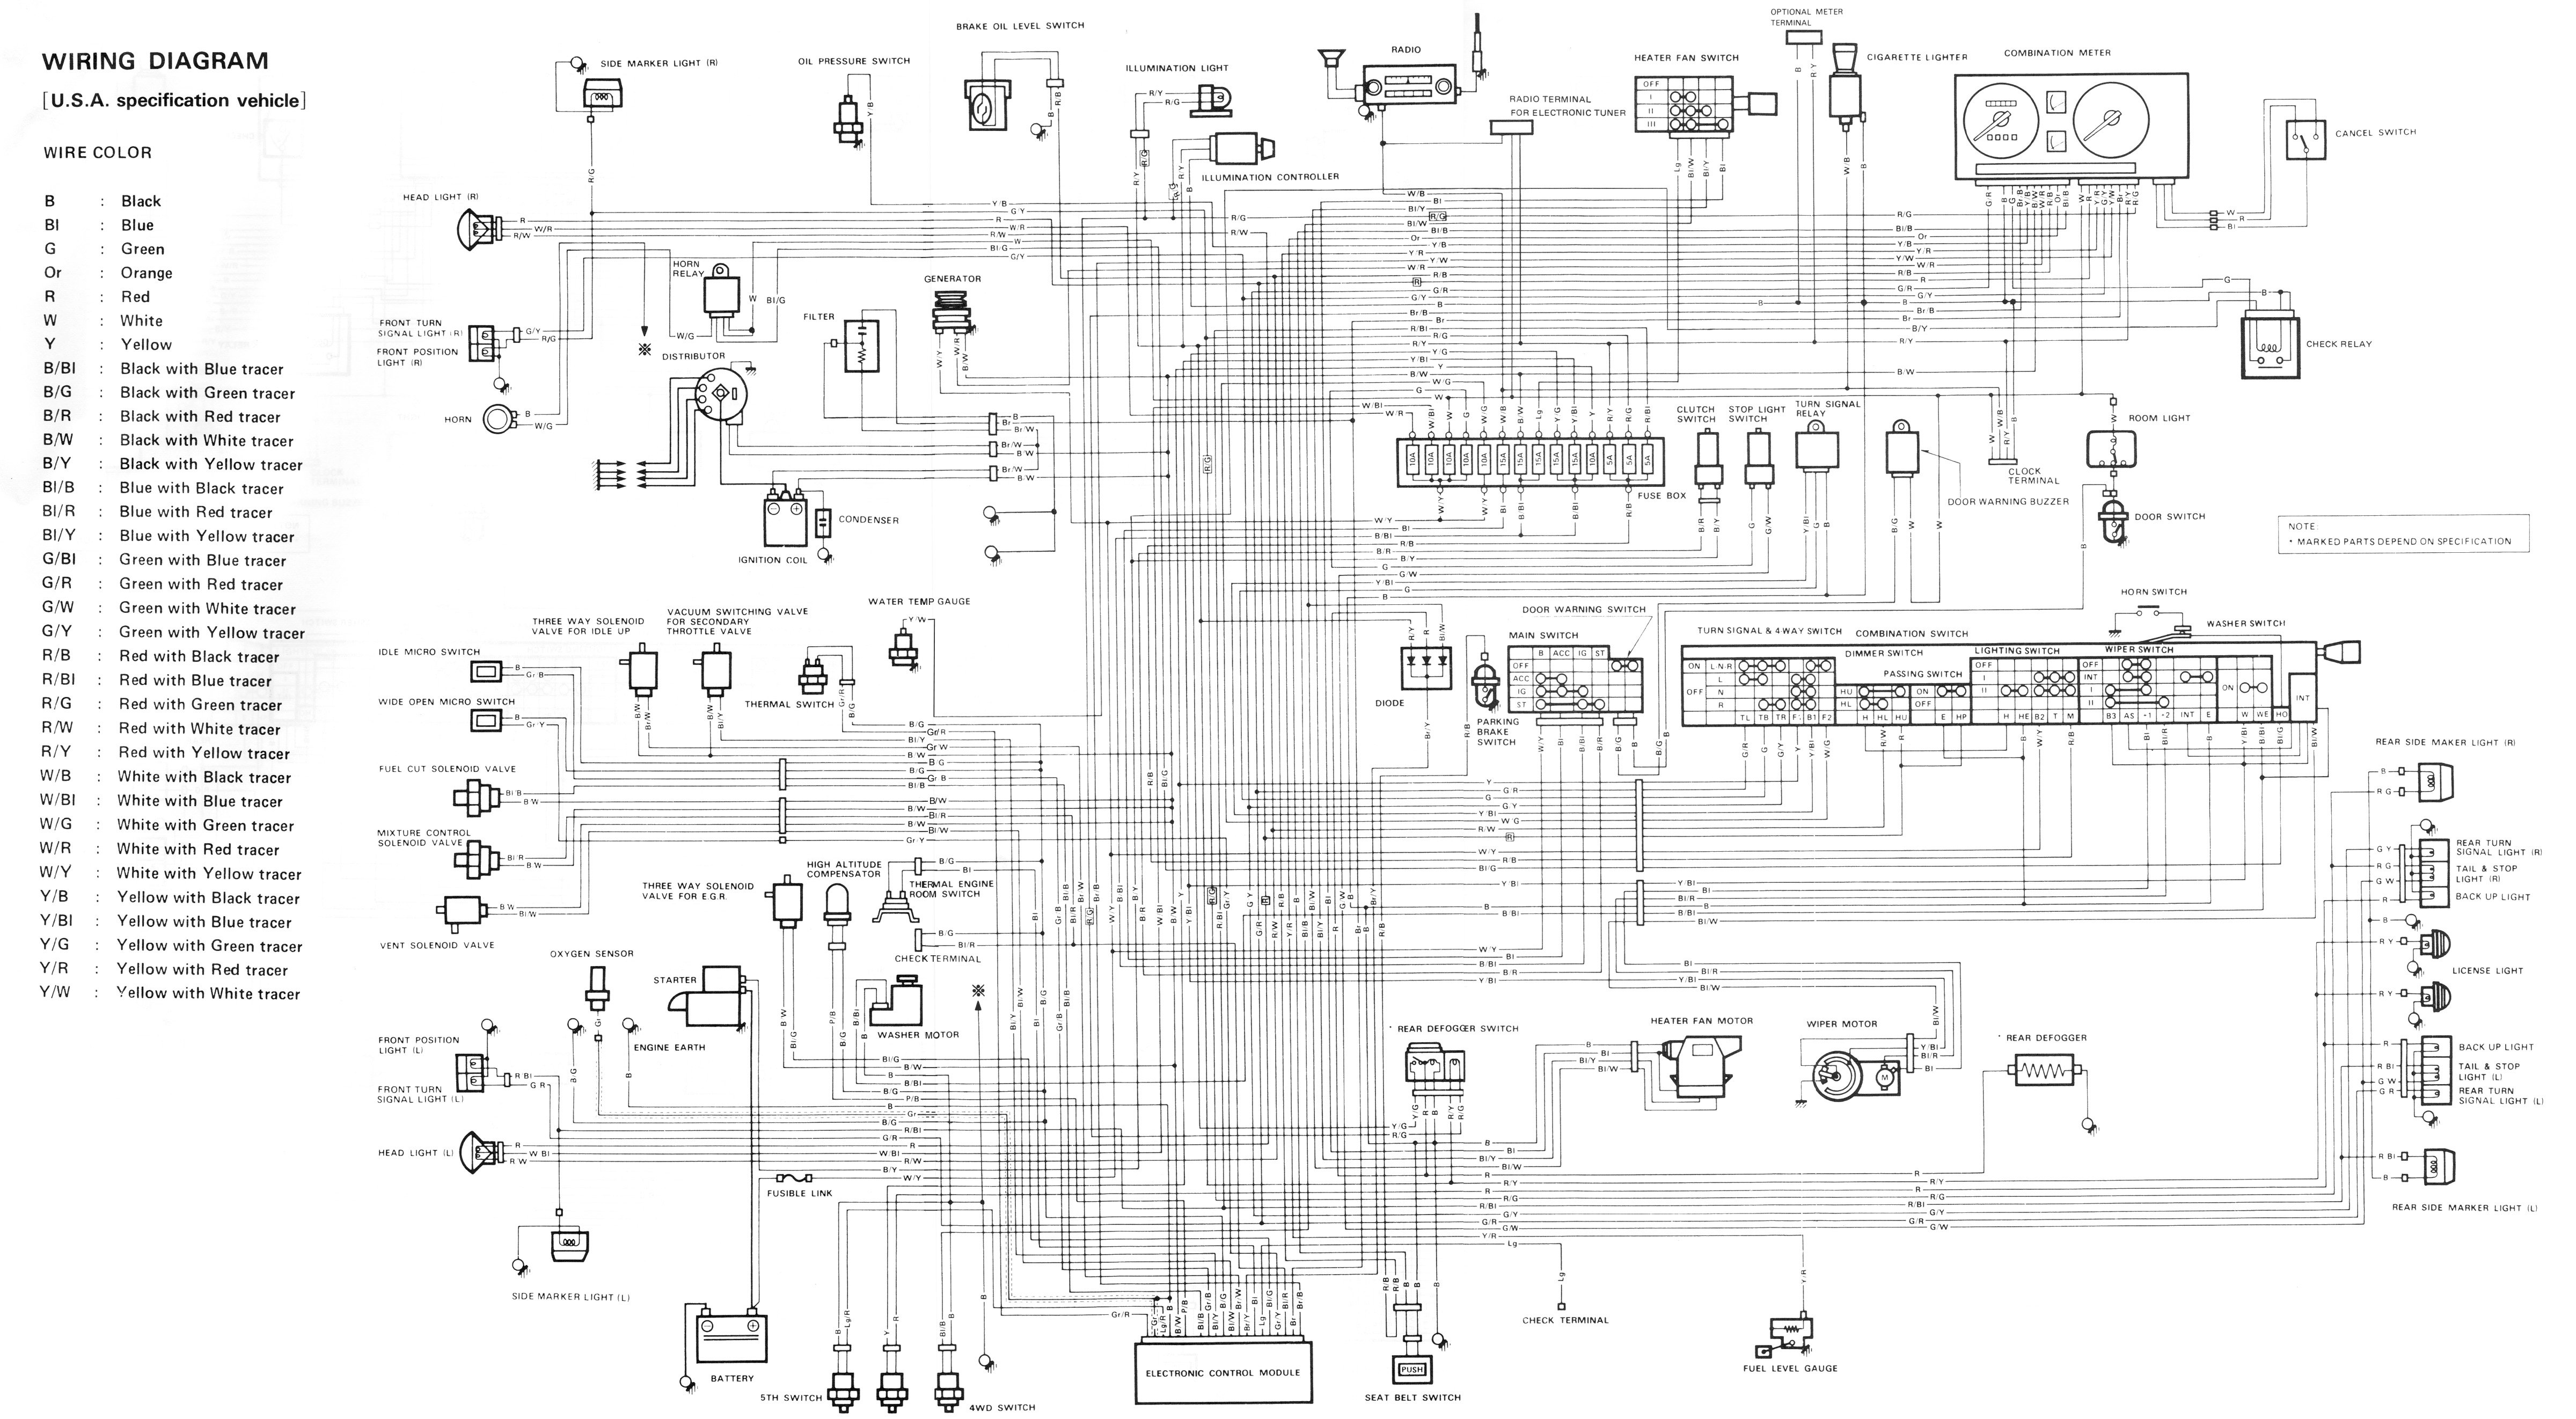 1989 suzuki samurai wiring diagram wiring diagrams konsult